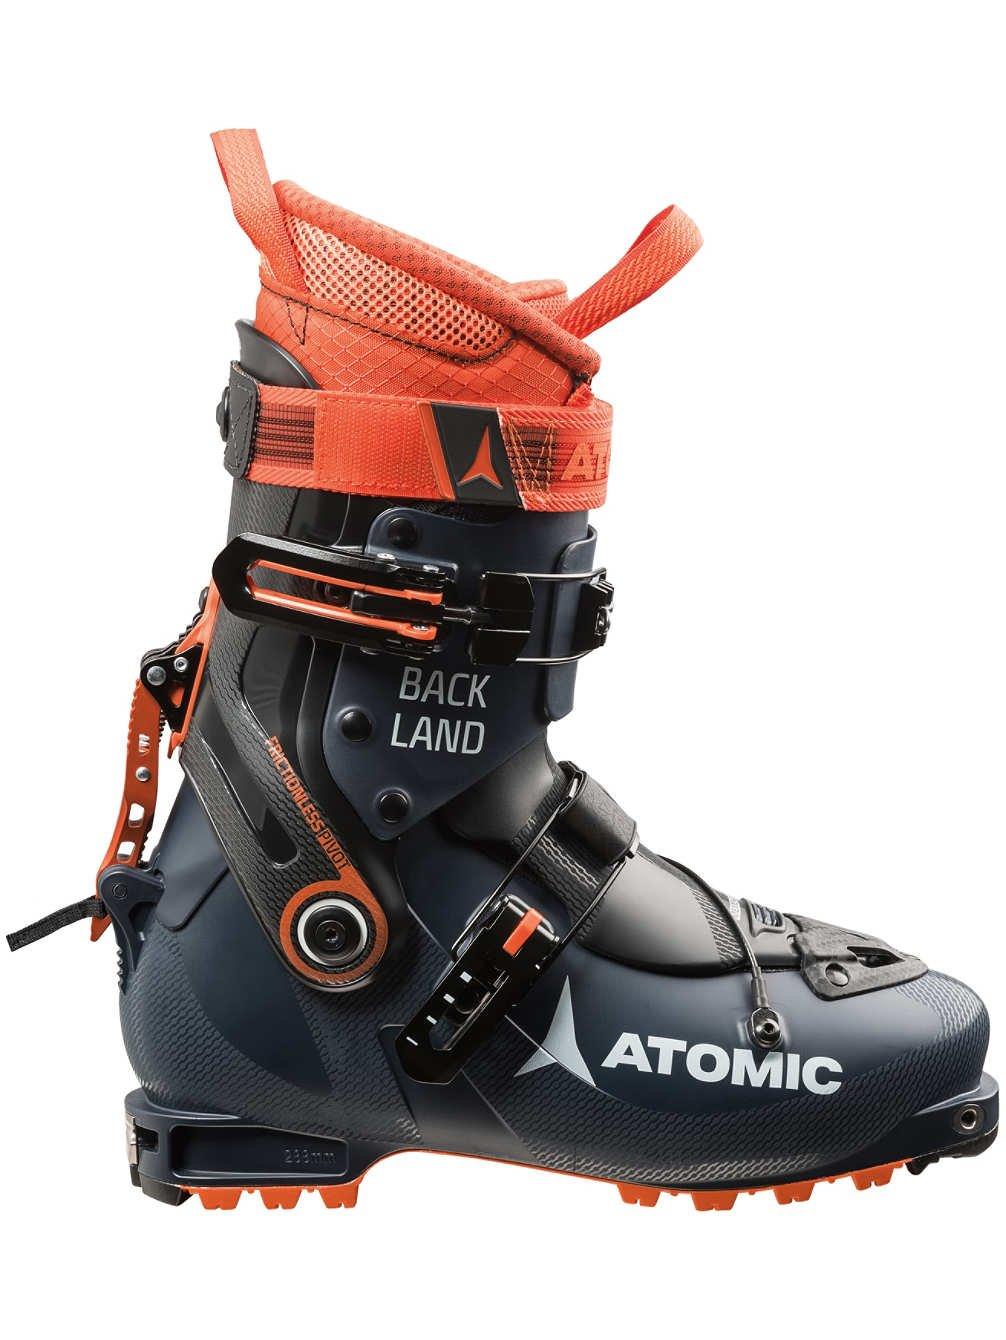 Atomic Backland Alpine Touring Boot Dark Blue/Orange/Black, 25.5